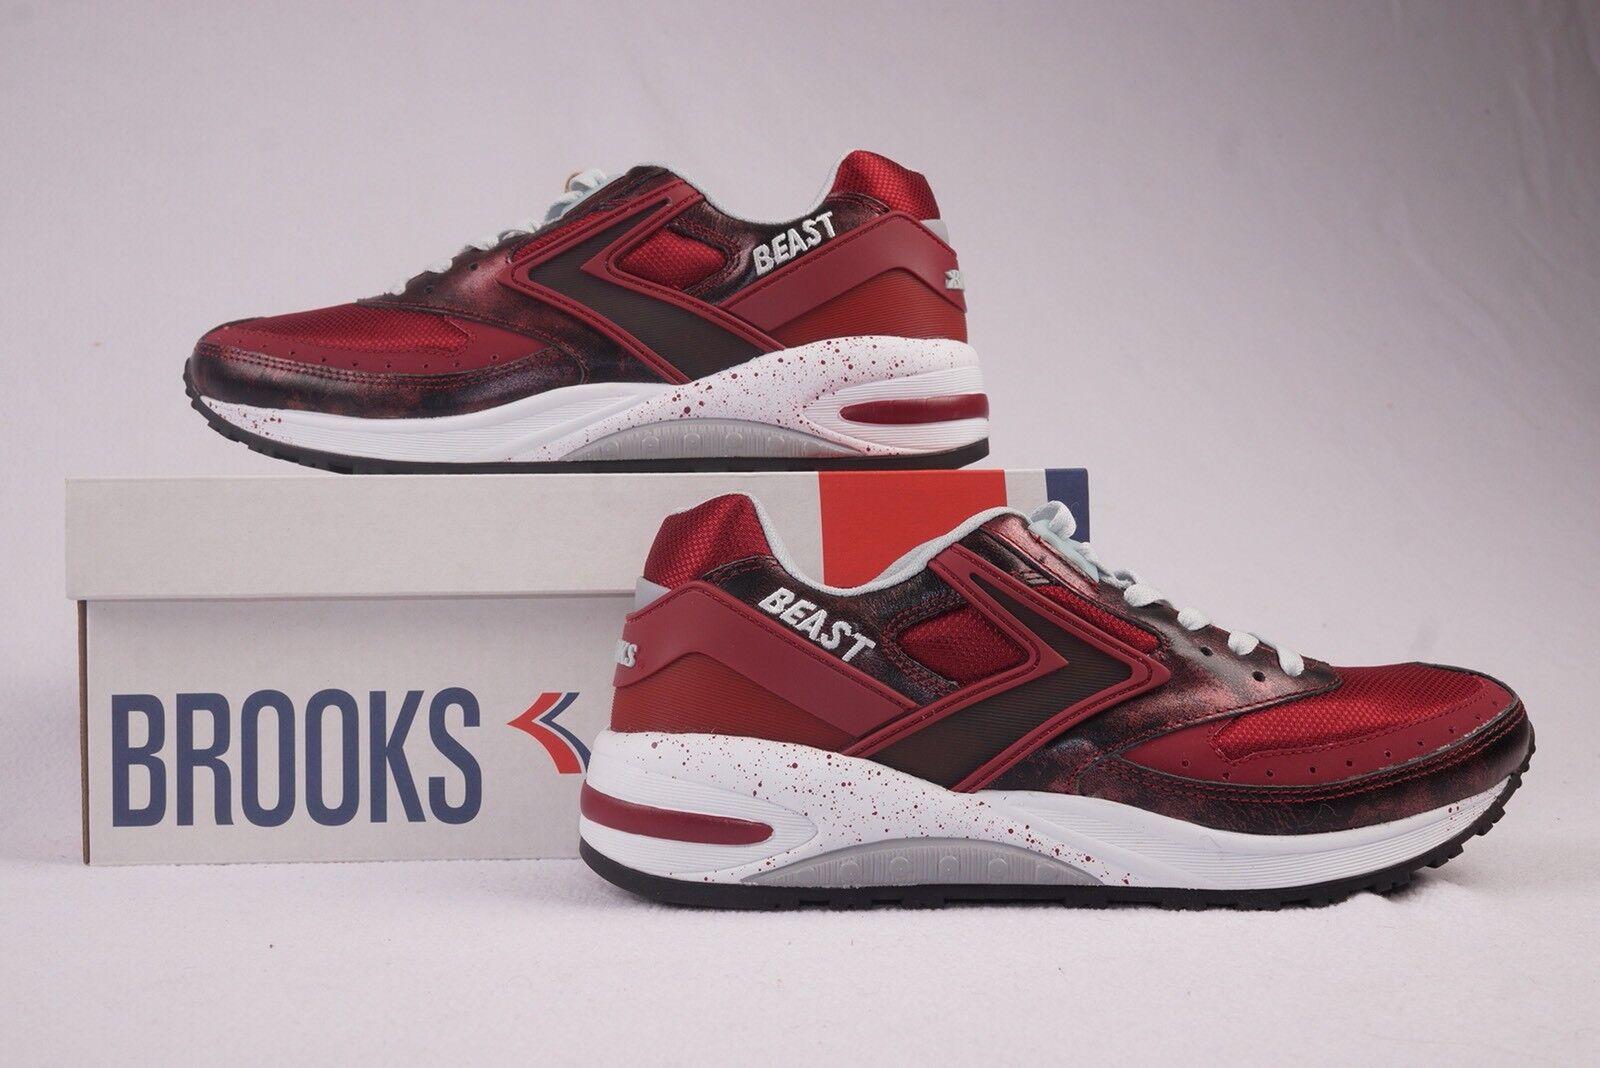 Brooks Beast 1 Mens Running shoes Rumba Red Sneakers Vintage 90s TB NIB New